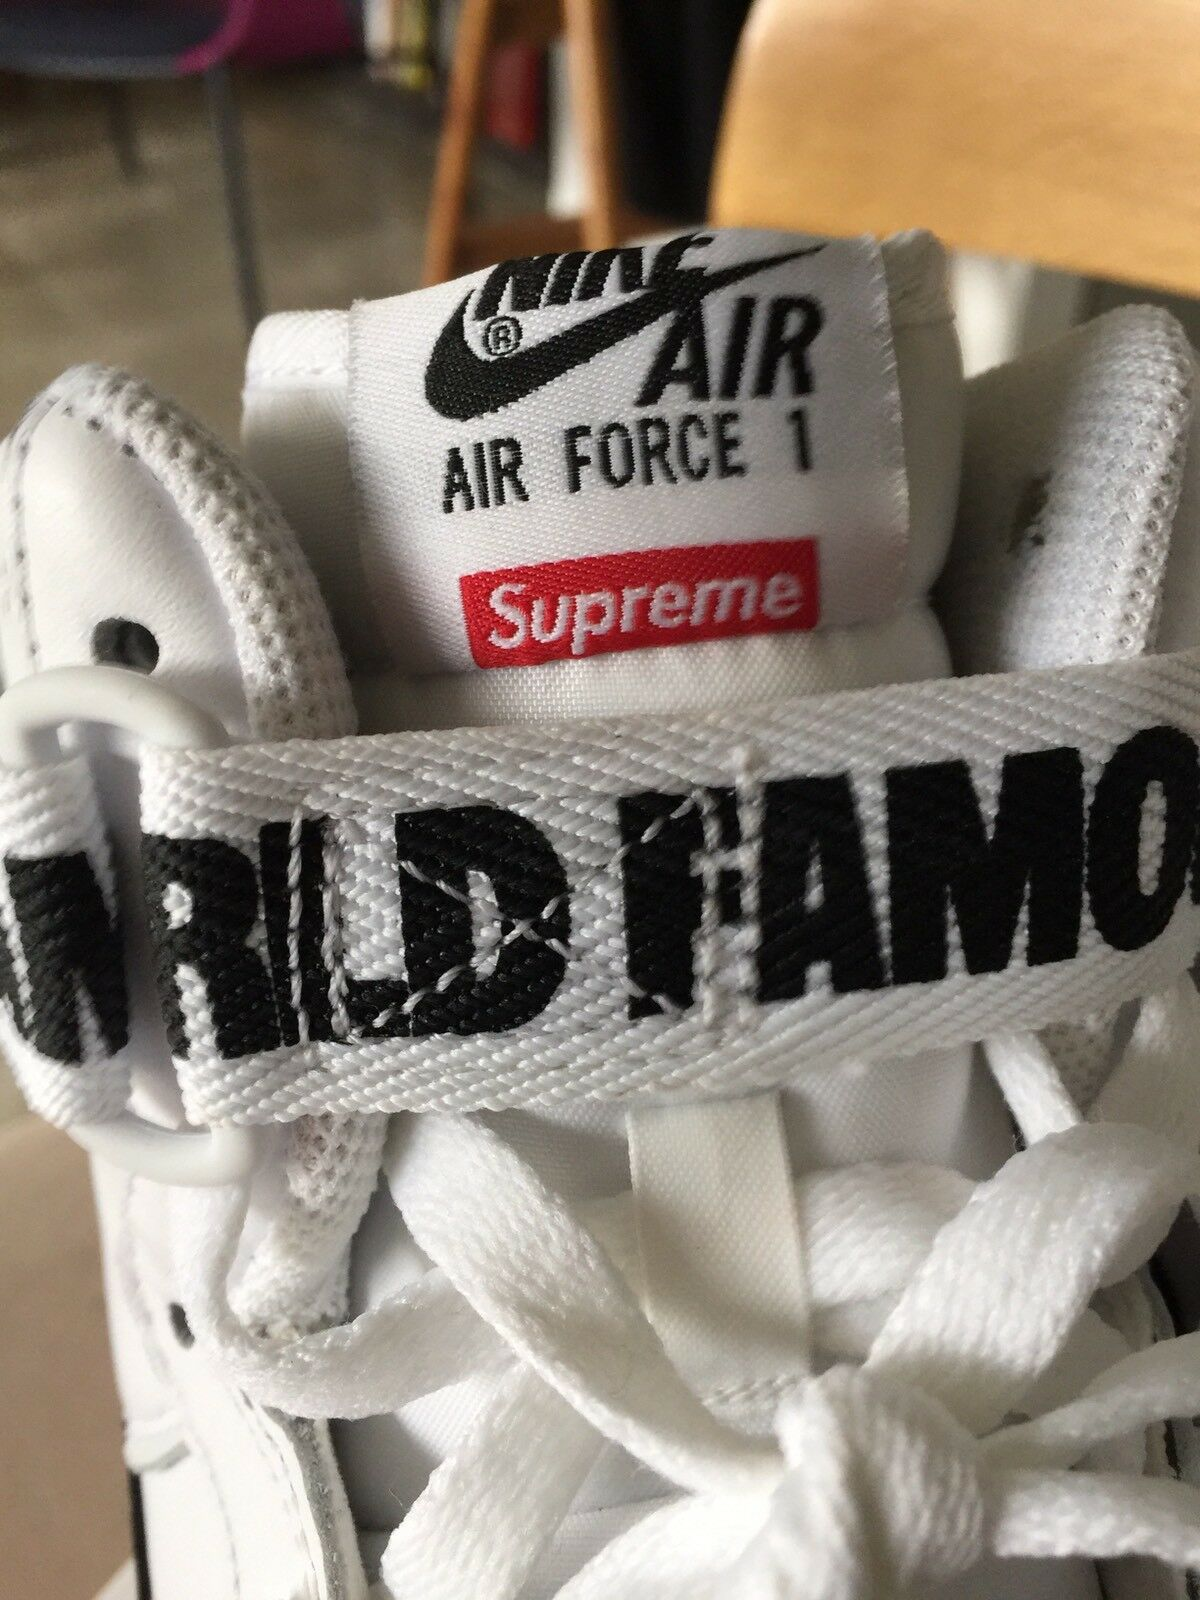 Nike Air Force Force Force 1 Supreme High 9 White Red Black Sf Af1 Dunk Air Max c131a8